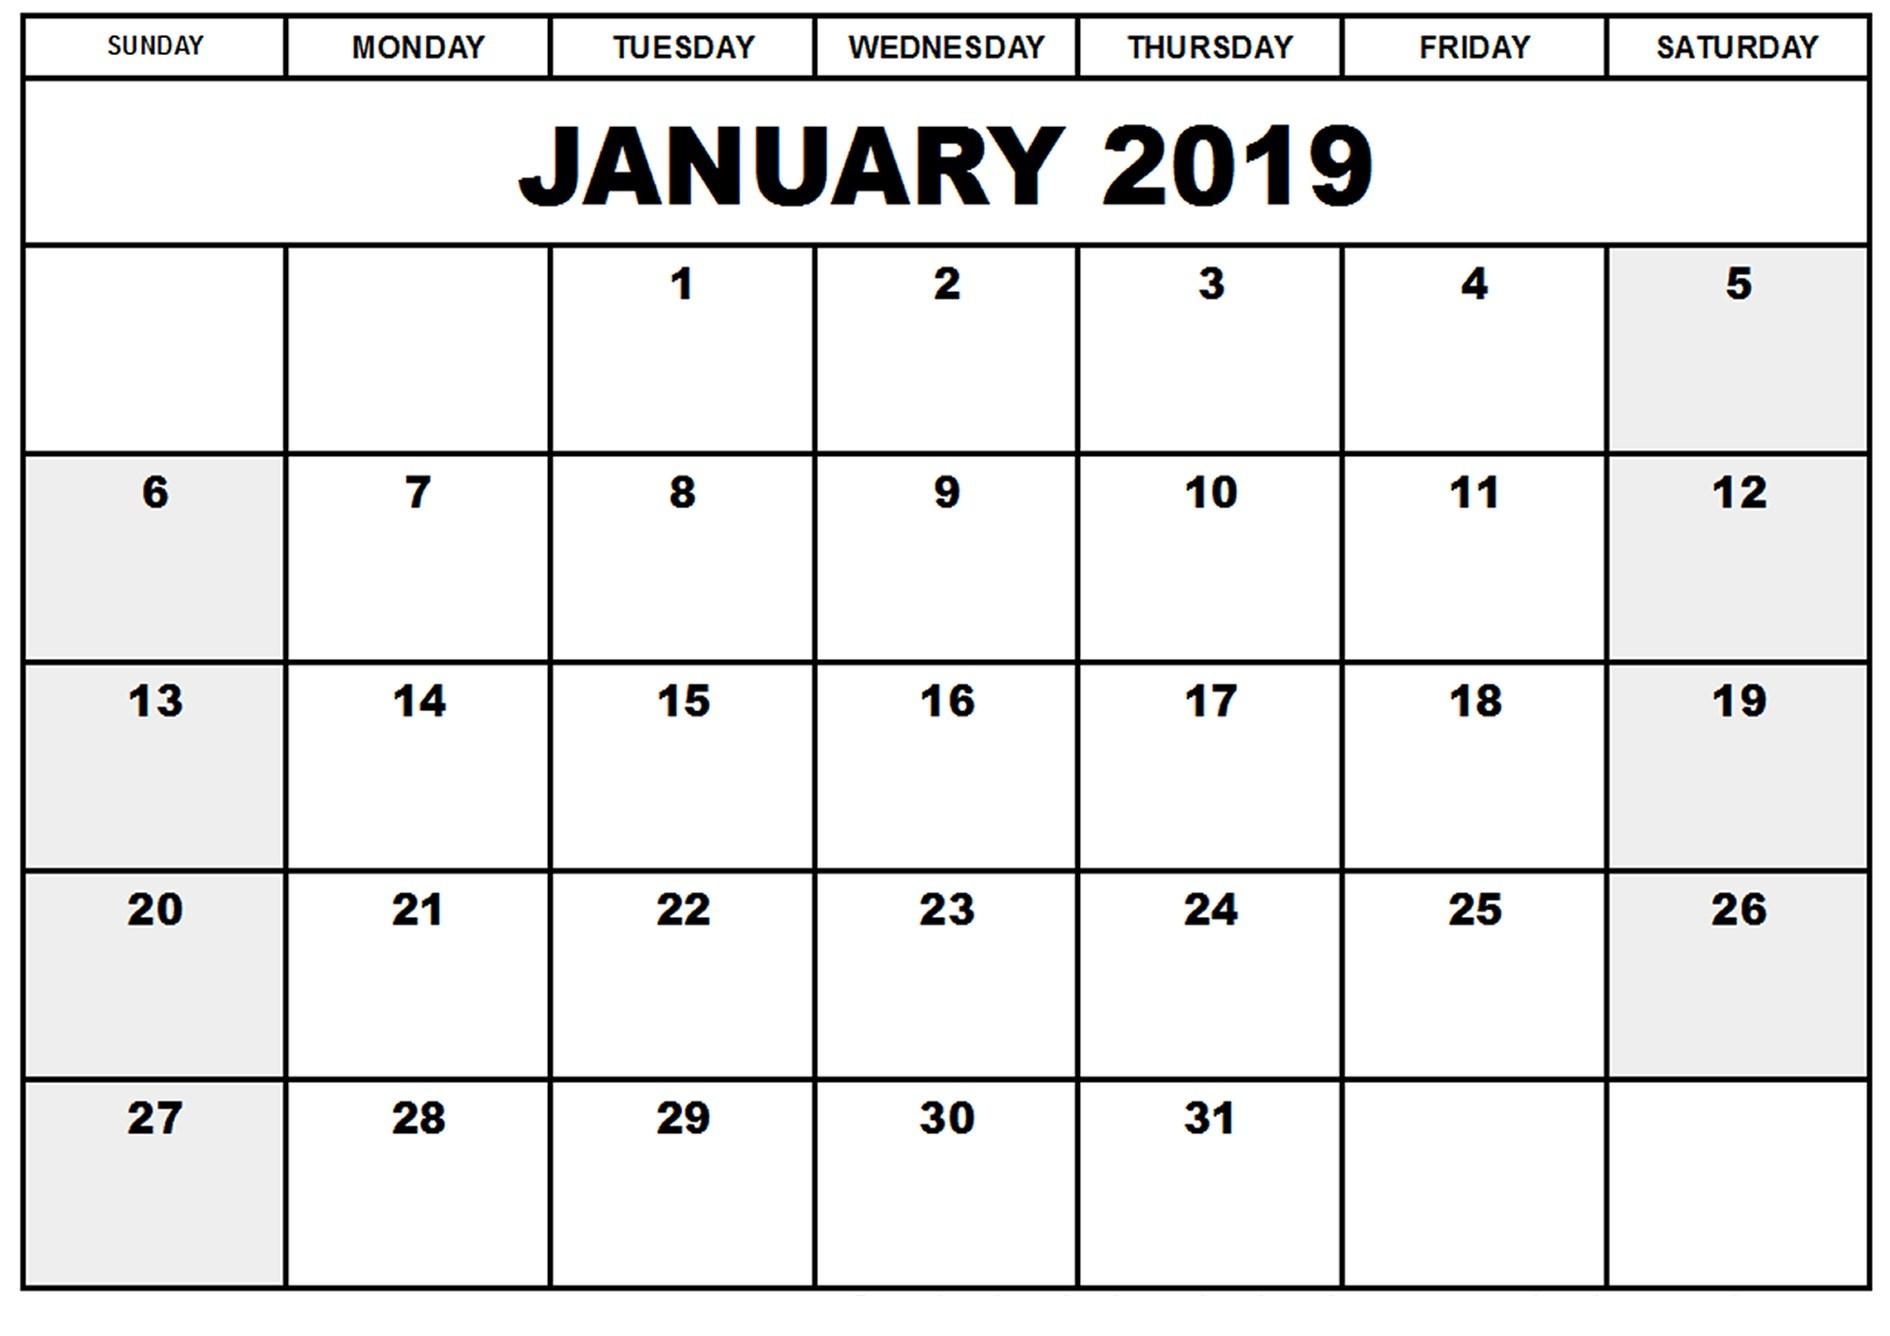 January 2019 Calendar Printable Blank Templates - Free Word Pdf pertaining to January Calendar Printable Template With Holidays